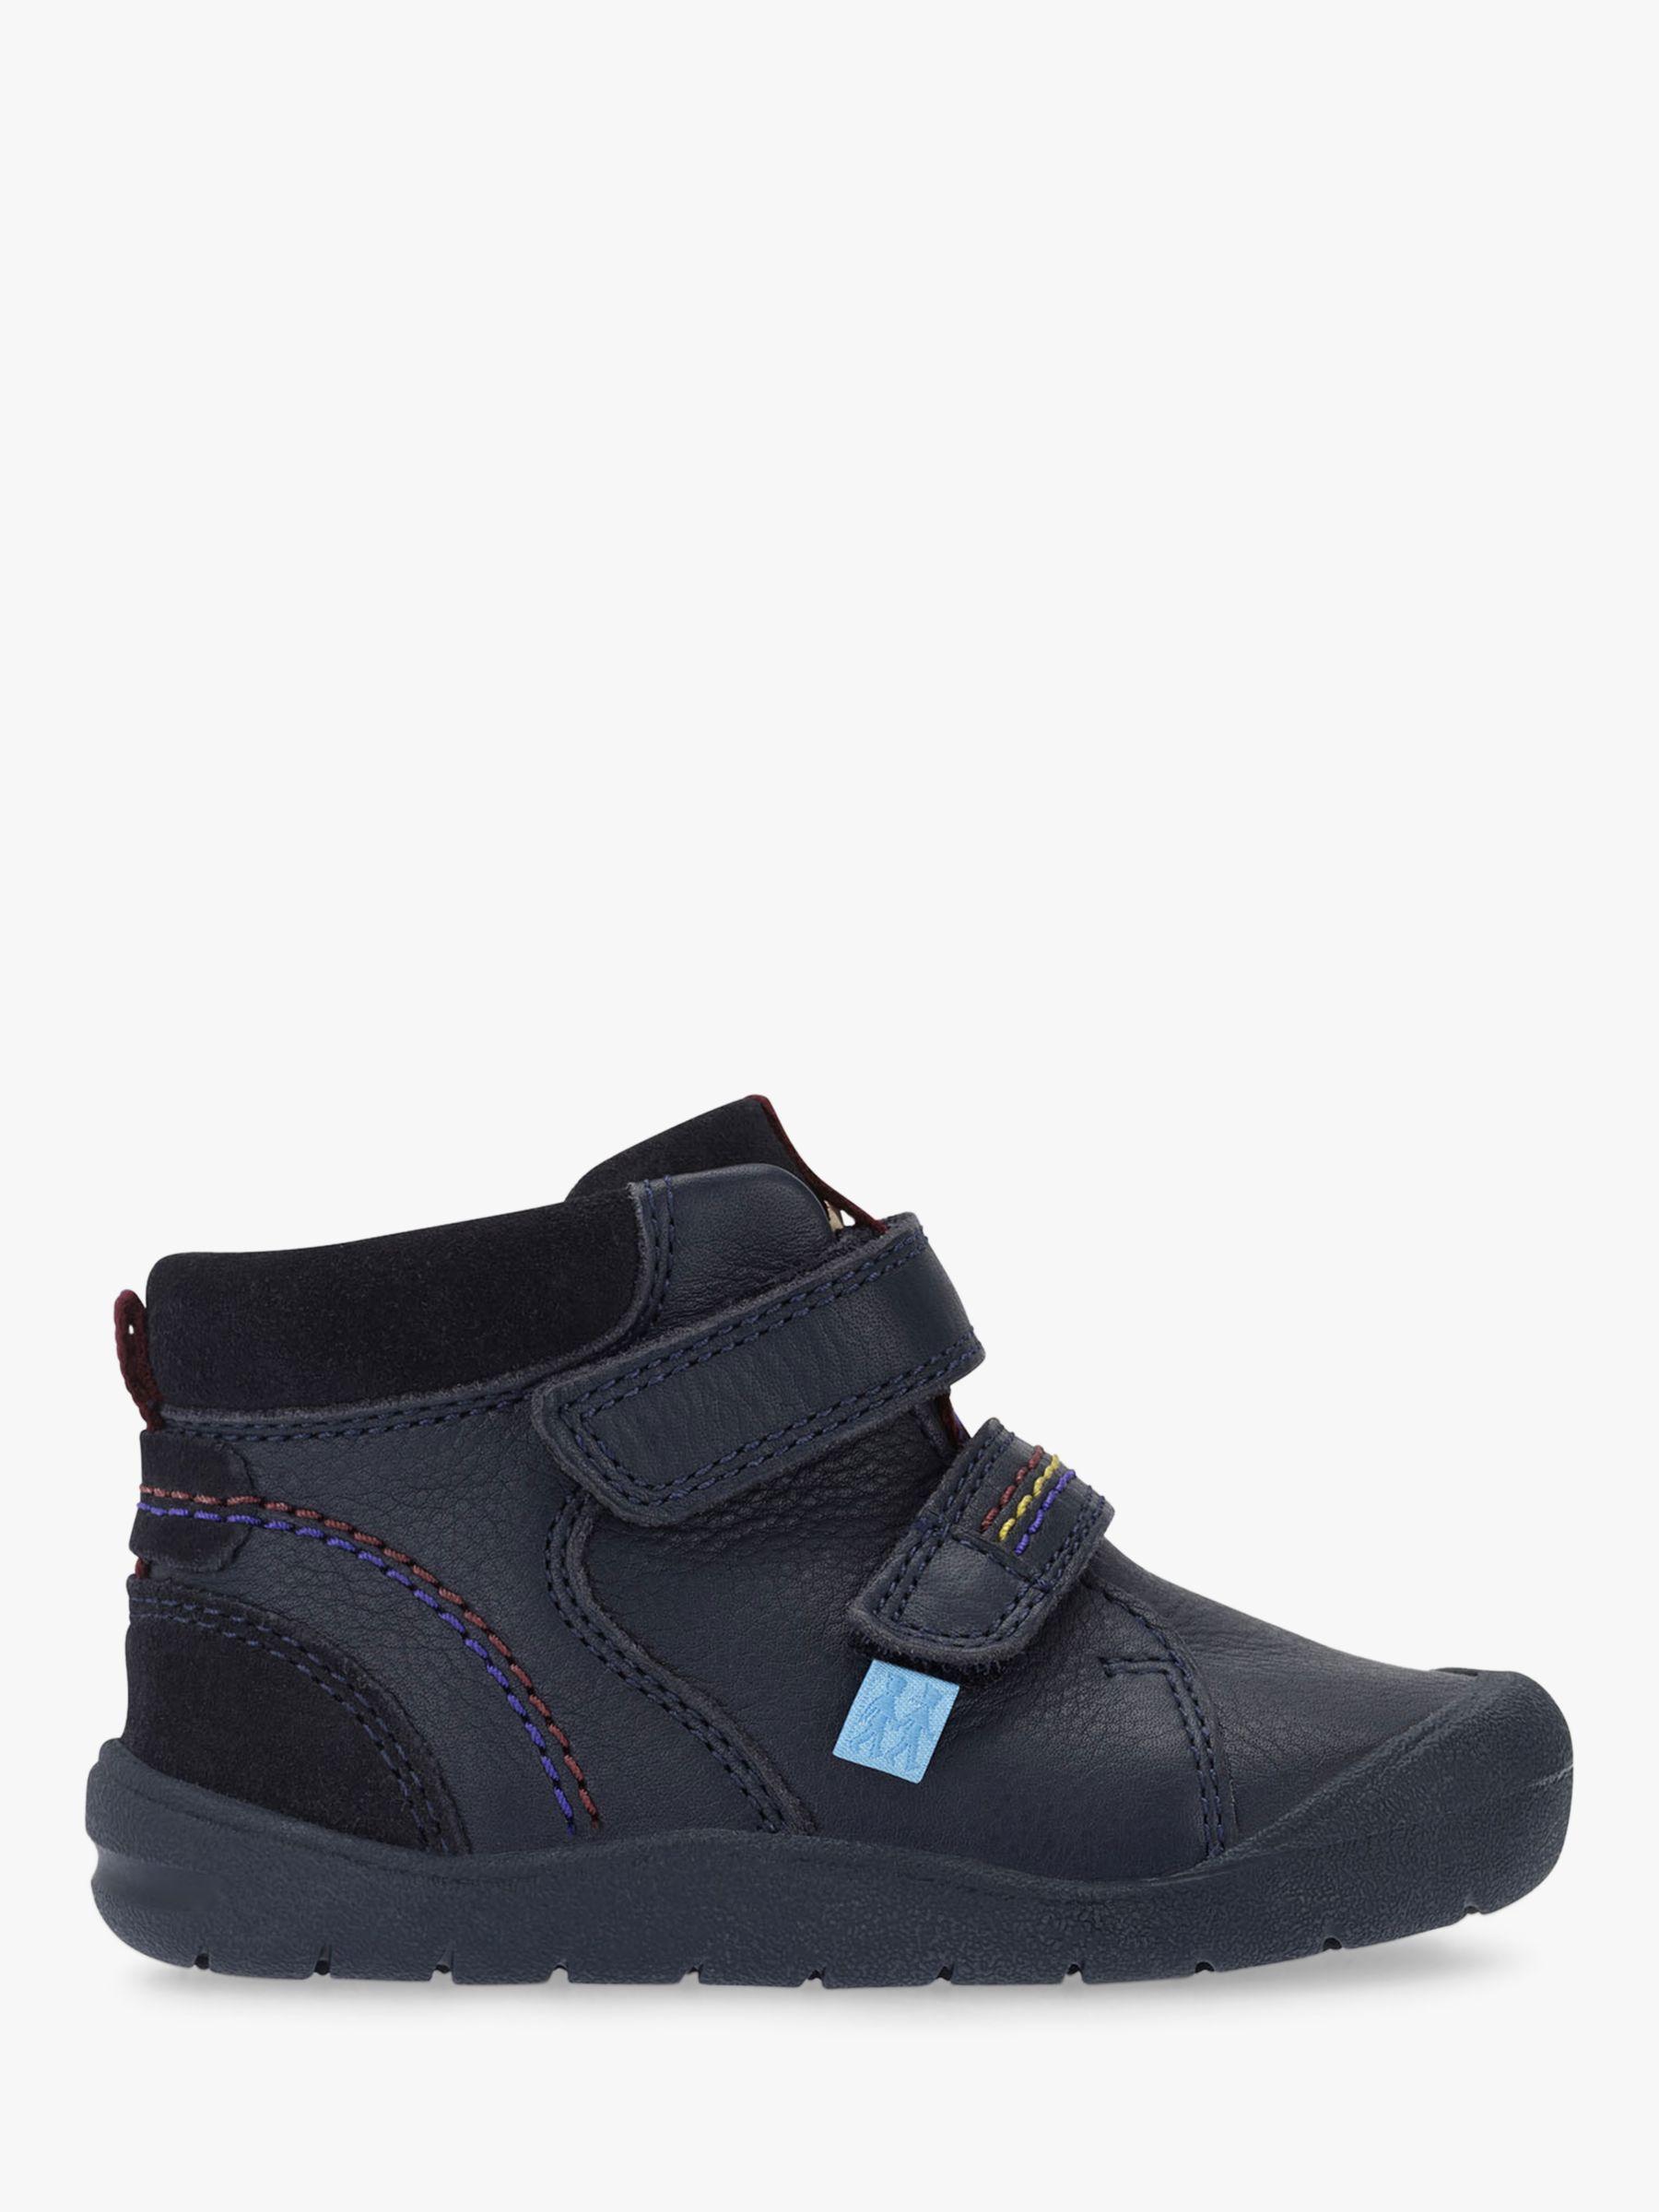 Start-Rite Start-rite Children's Burst Shoes, Navy